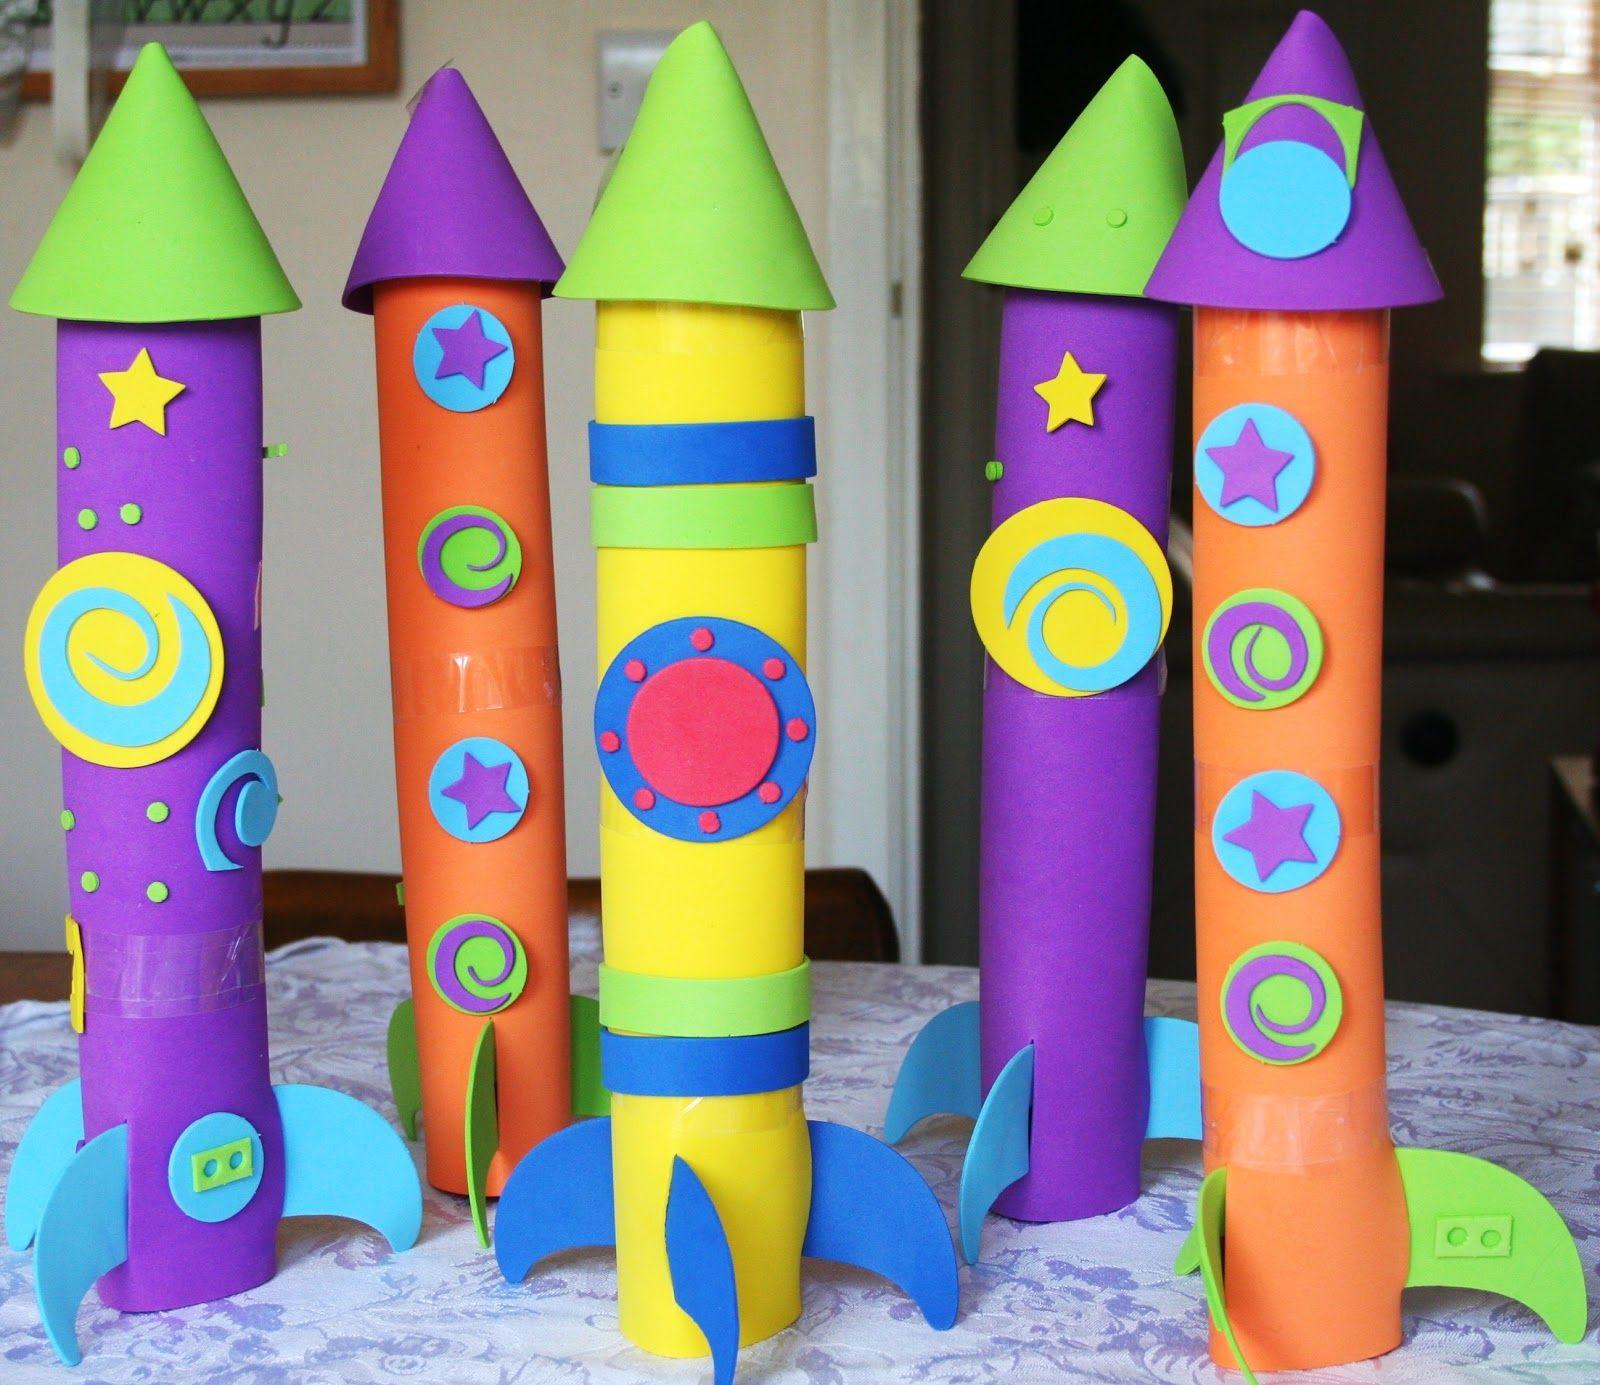 Easy to make rocket ships kids rocket crafts pinterest ships easy to make rocket ships solutioingenieria Image collections